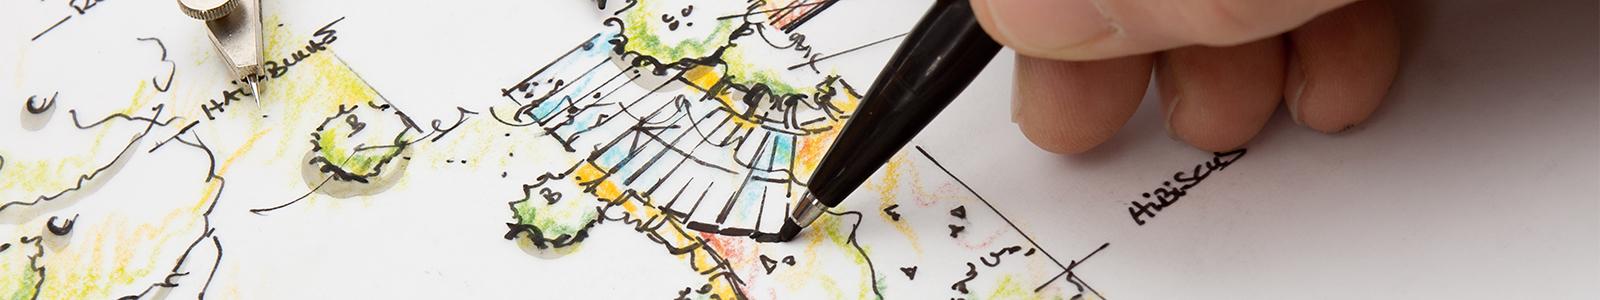 Designer working on plans for a new park